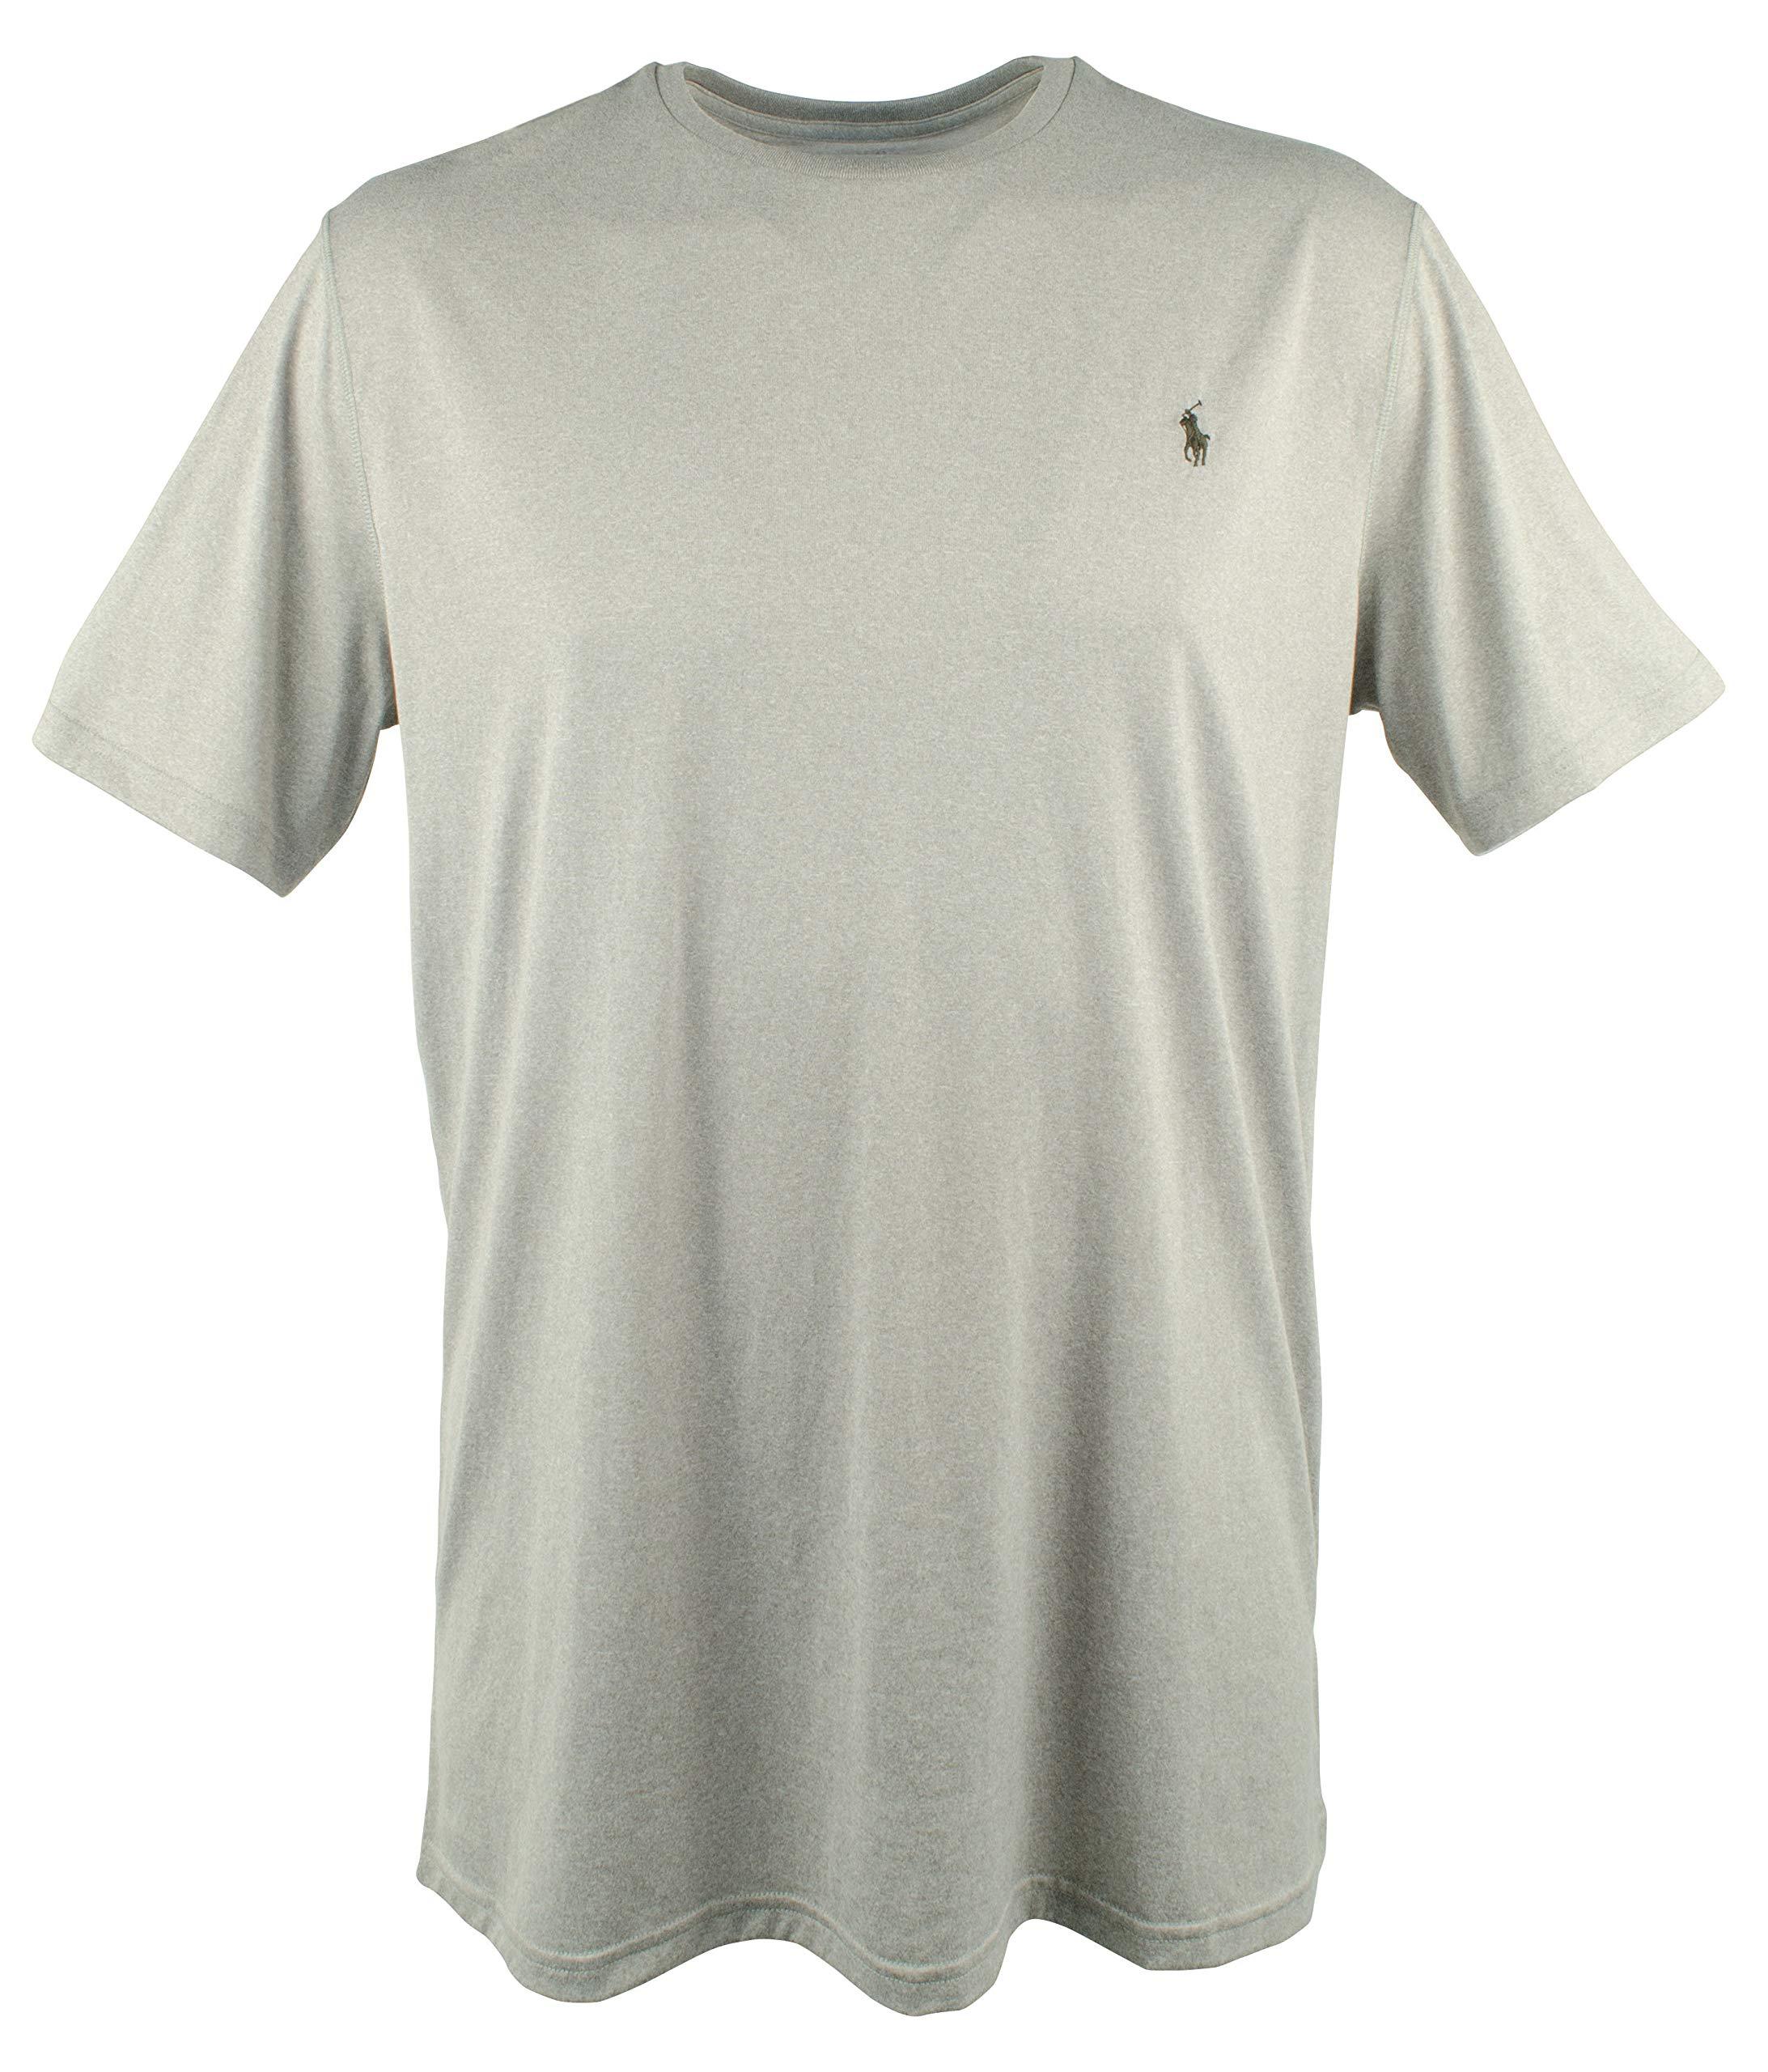 Polo Ralph Lauren Men's Big and Tall Performance Jersey T-Shirt-GH-3XB Grey Heather